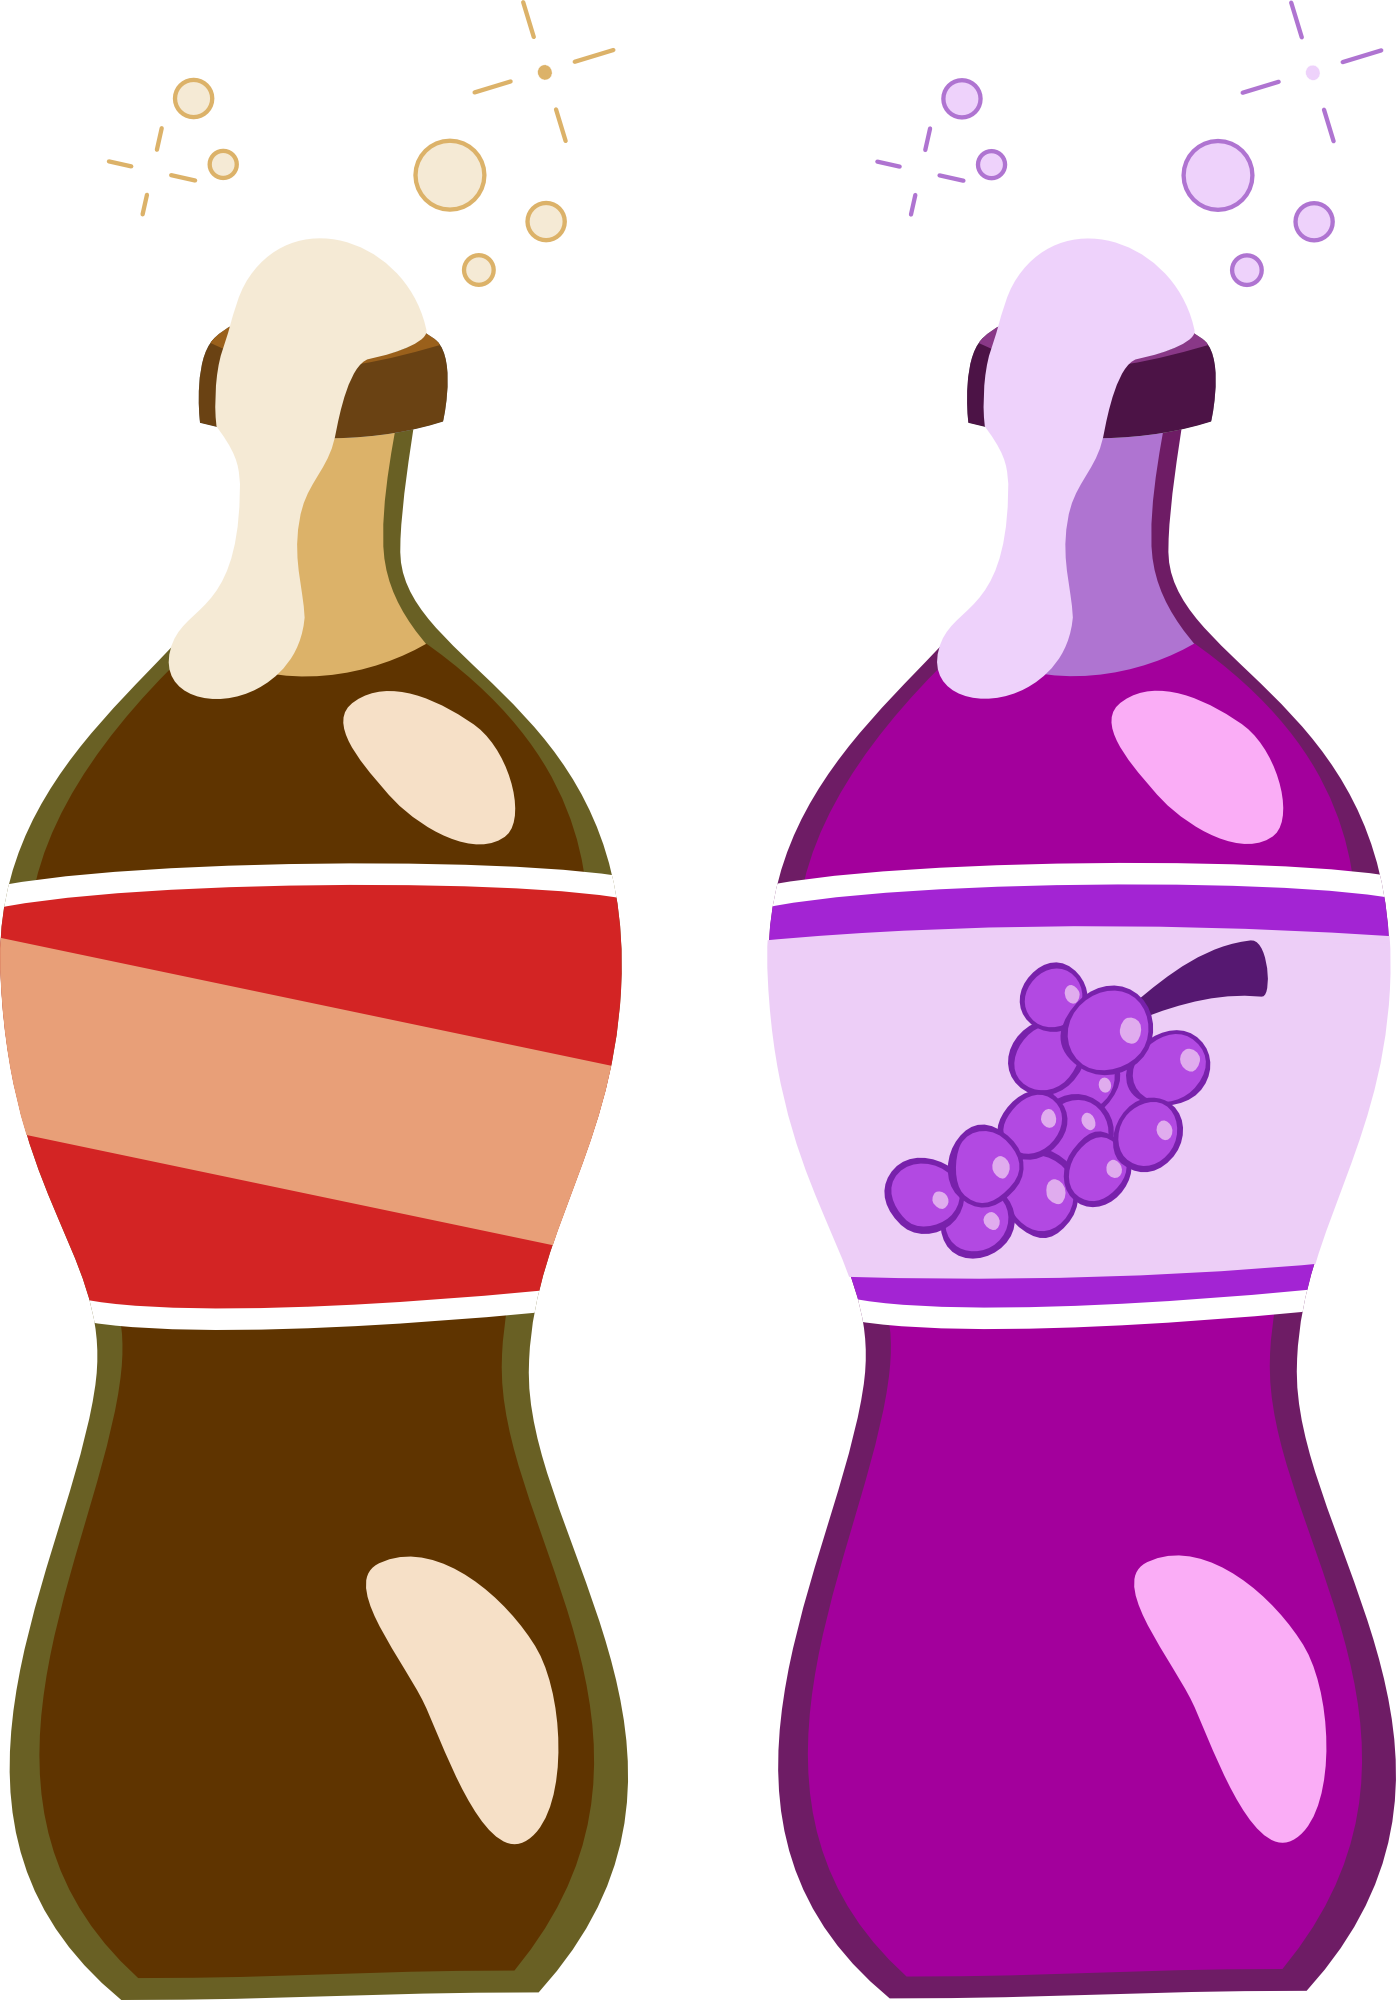 Bottle cutie mark request. Foods clipart soda